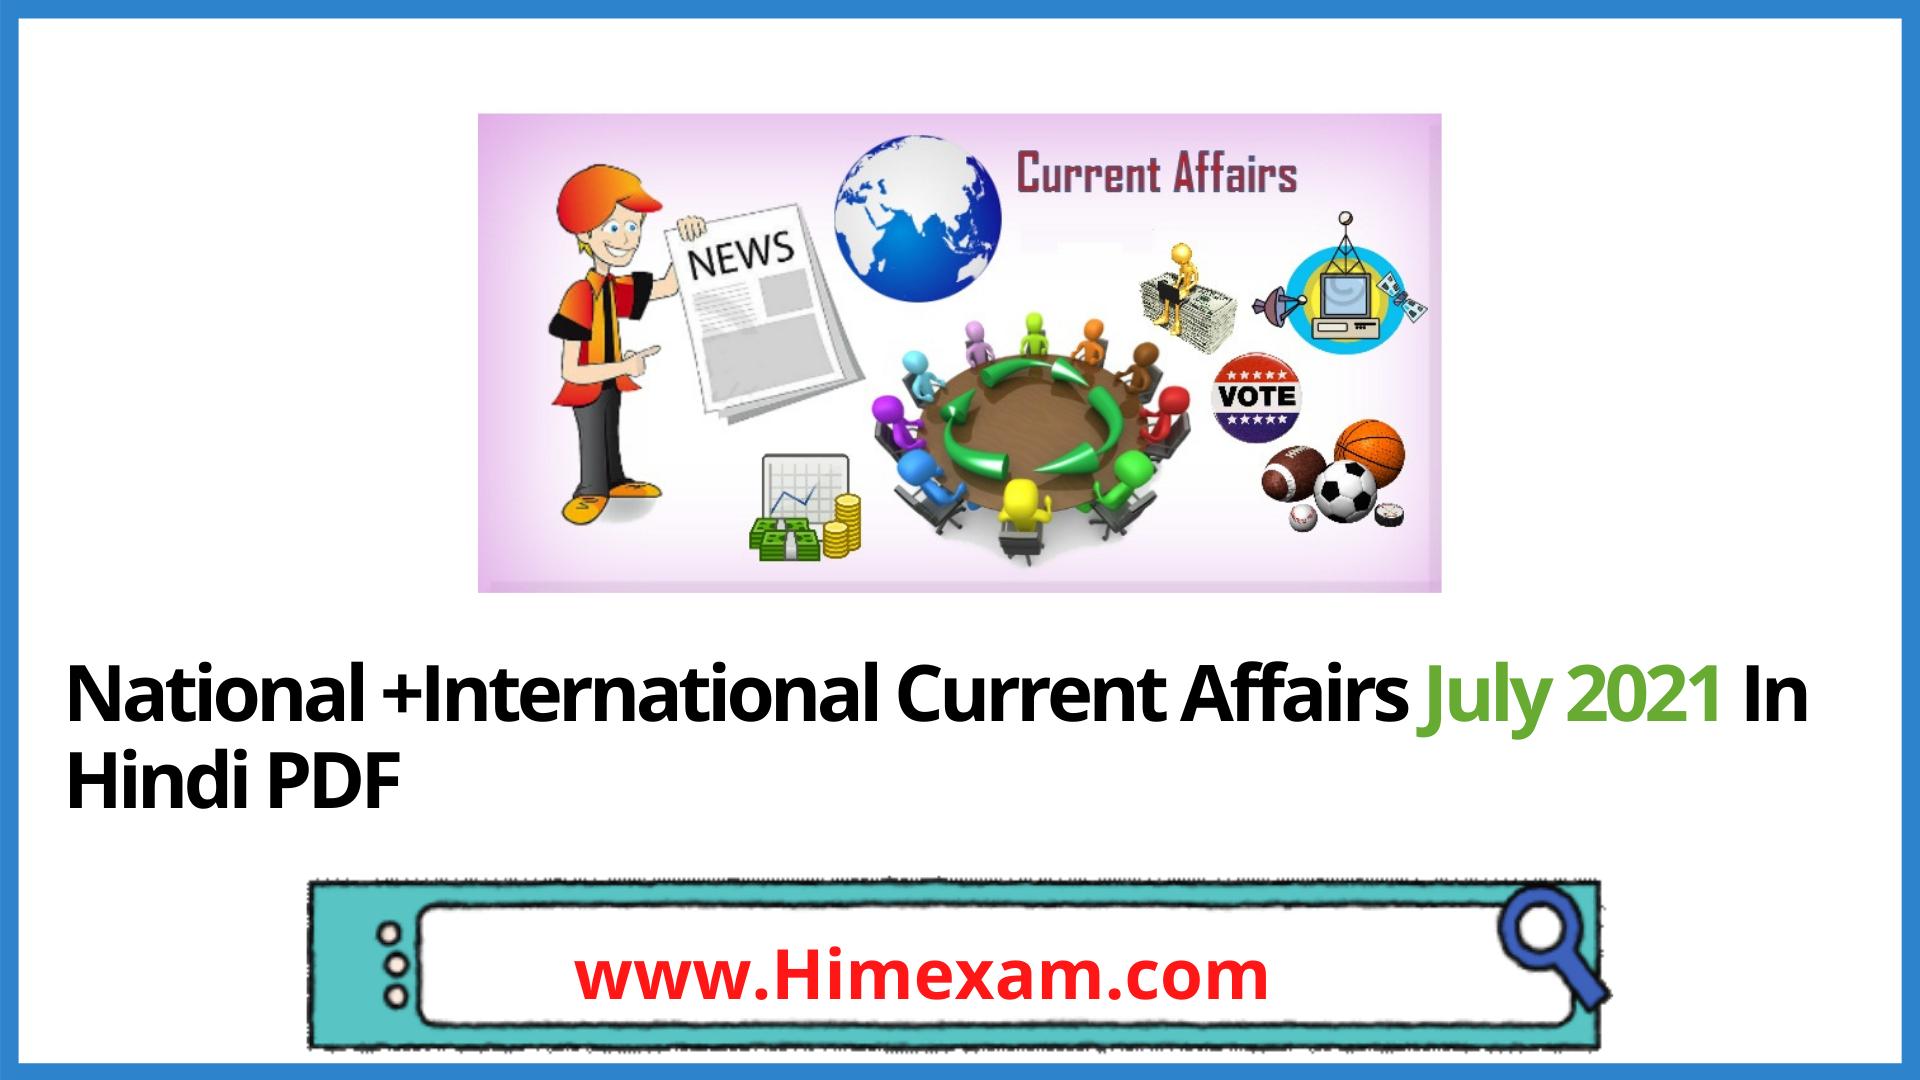 National +International Current Affairs July 2021 In Hindi PDF